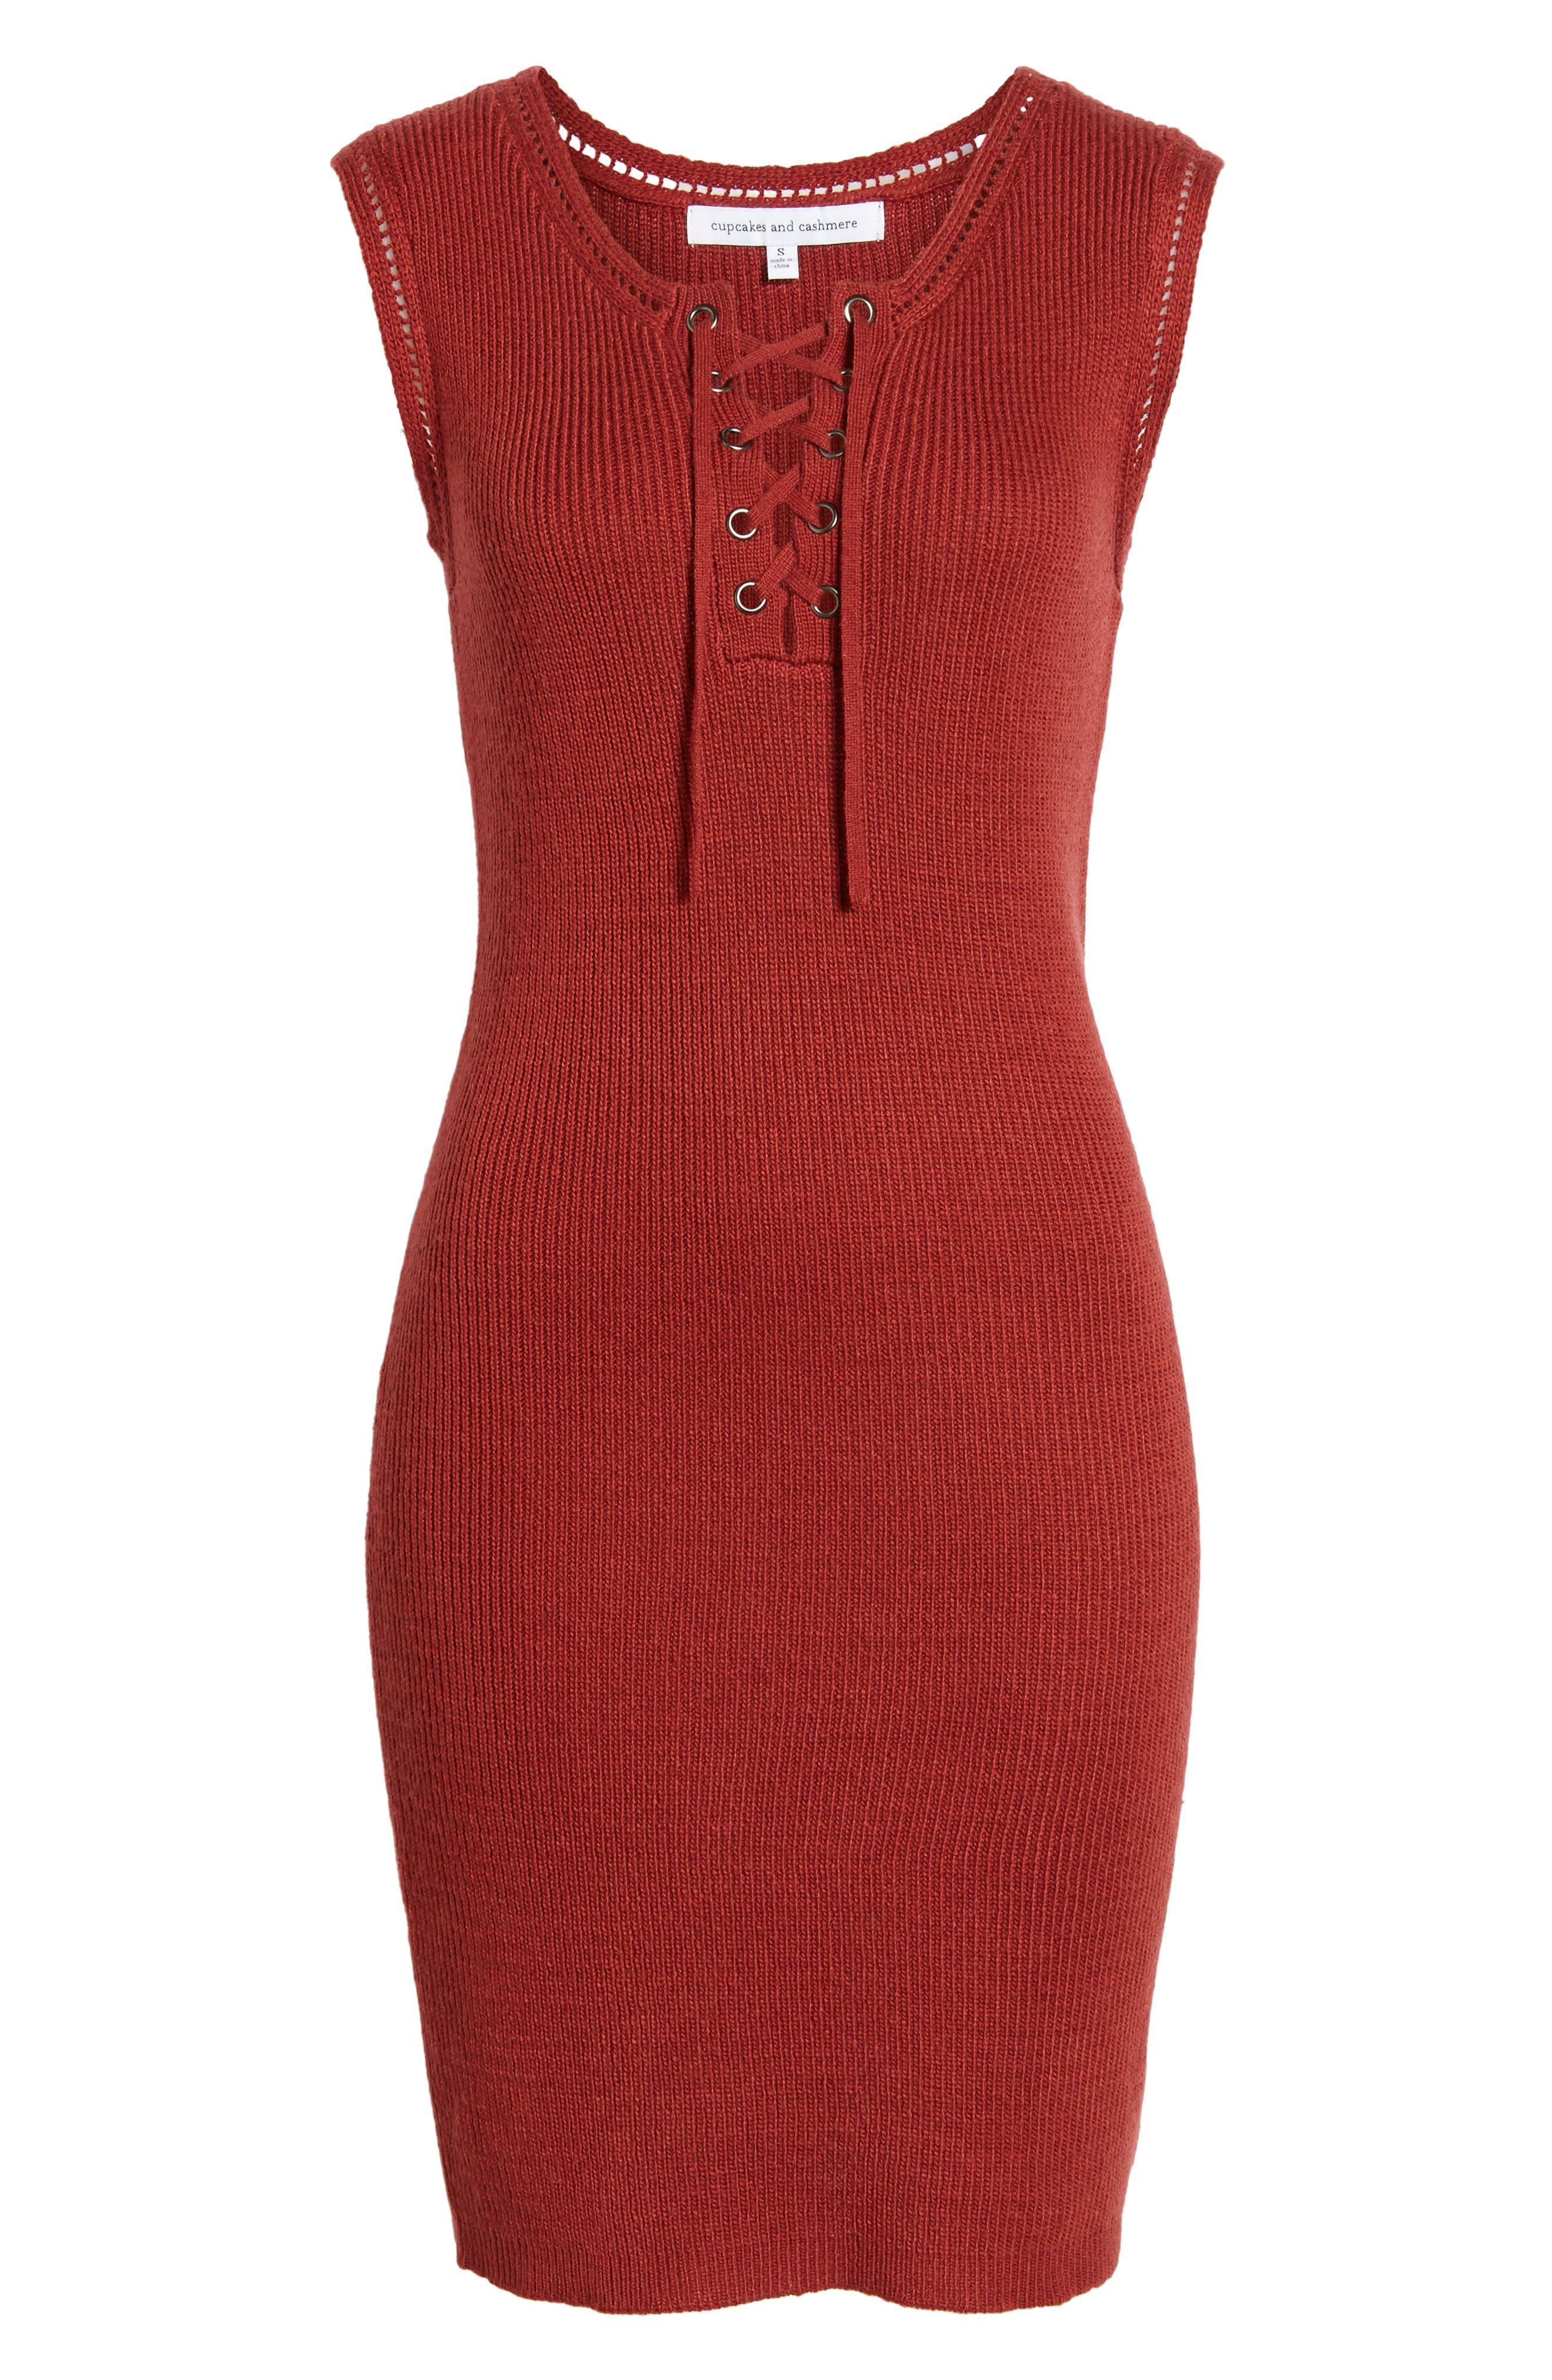 Thora Sheath Dress,                             Alternate thumbnail 6, color,                             605